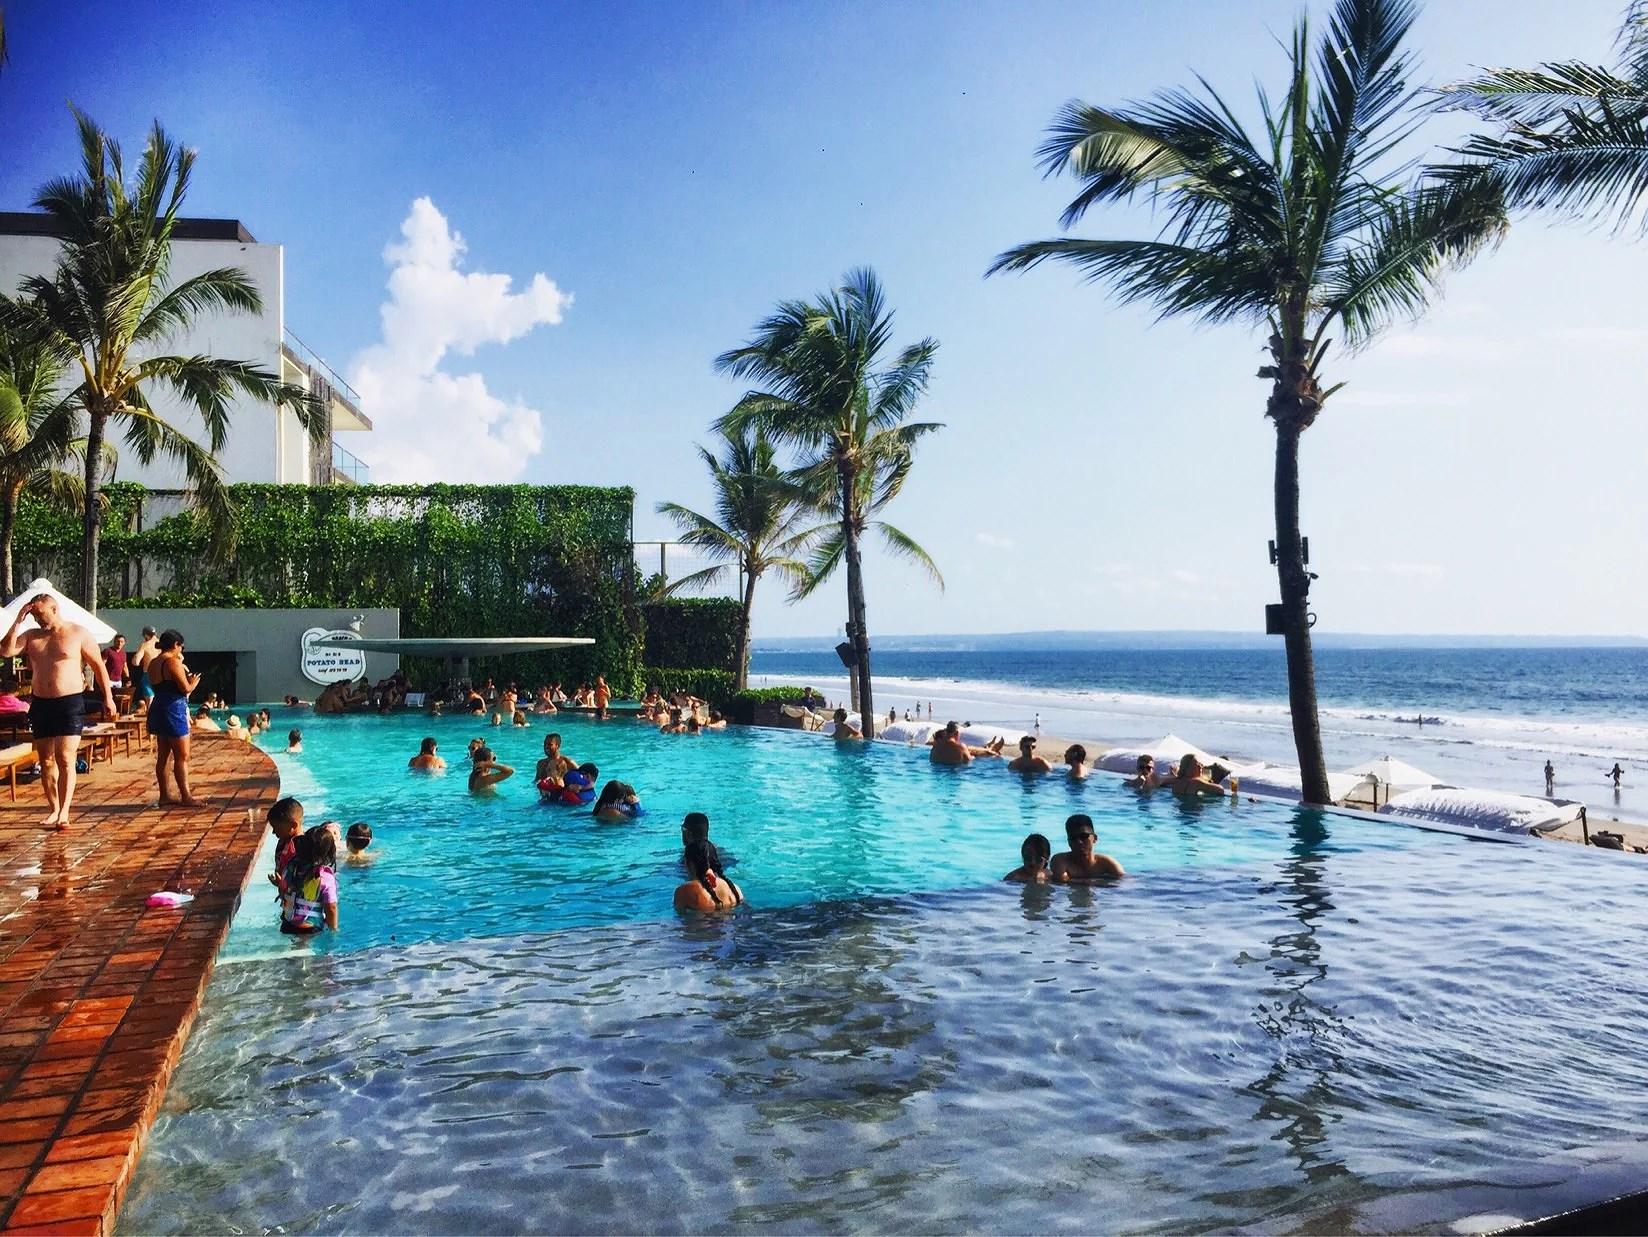 Bali, we need to talk...